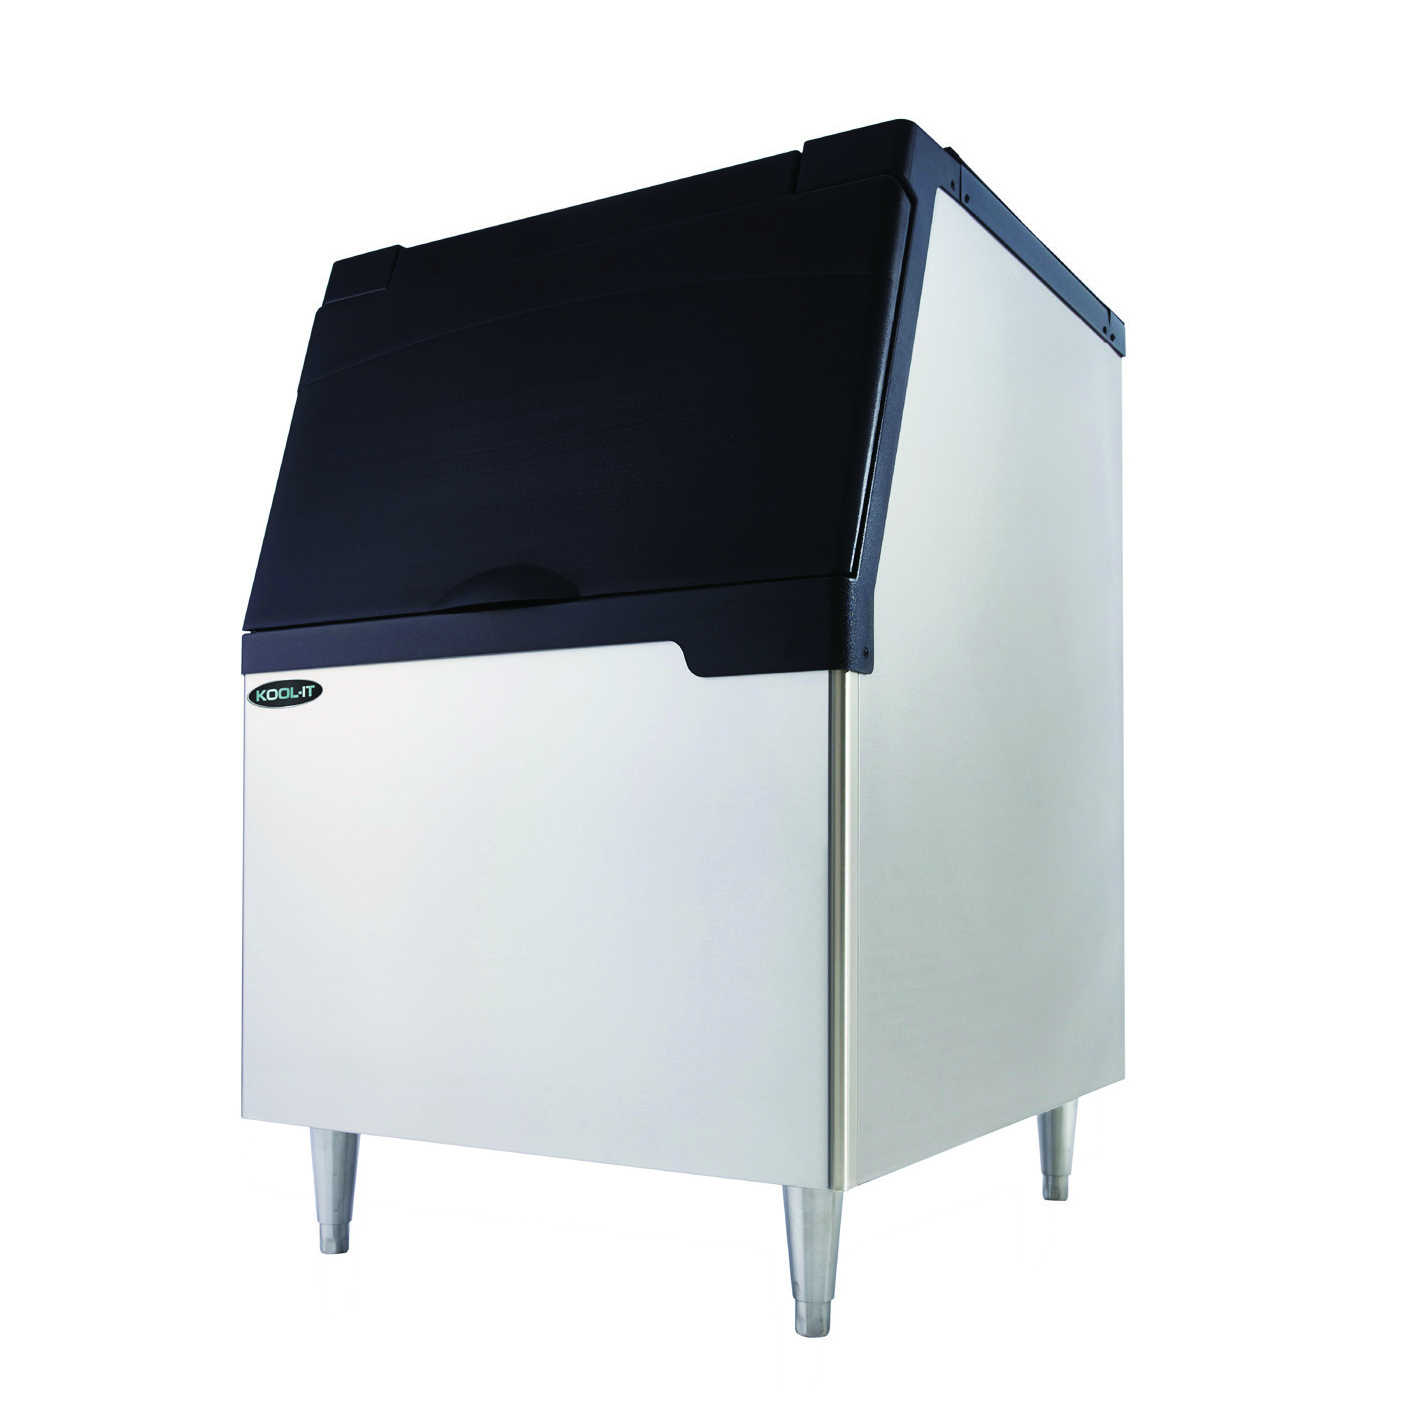 MVP Group LLC KB-440 ice bin for ice machines